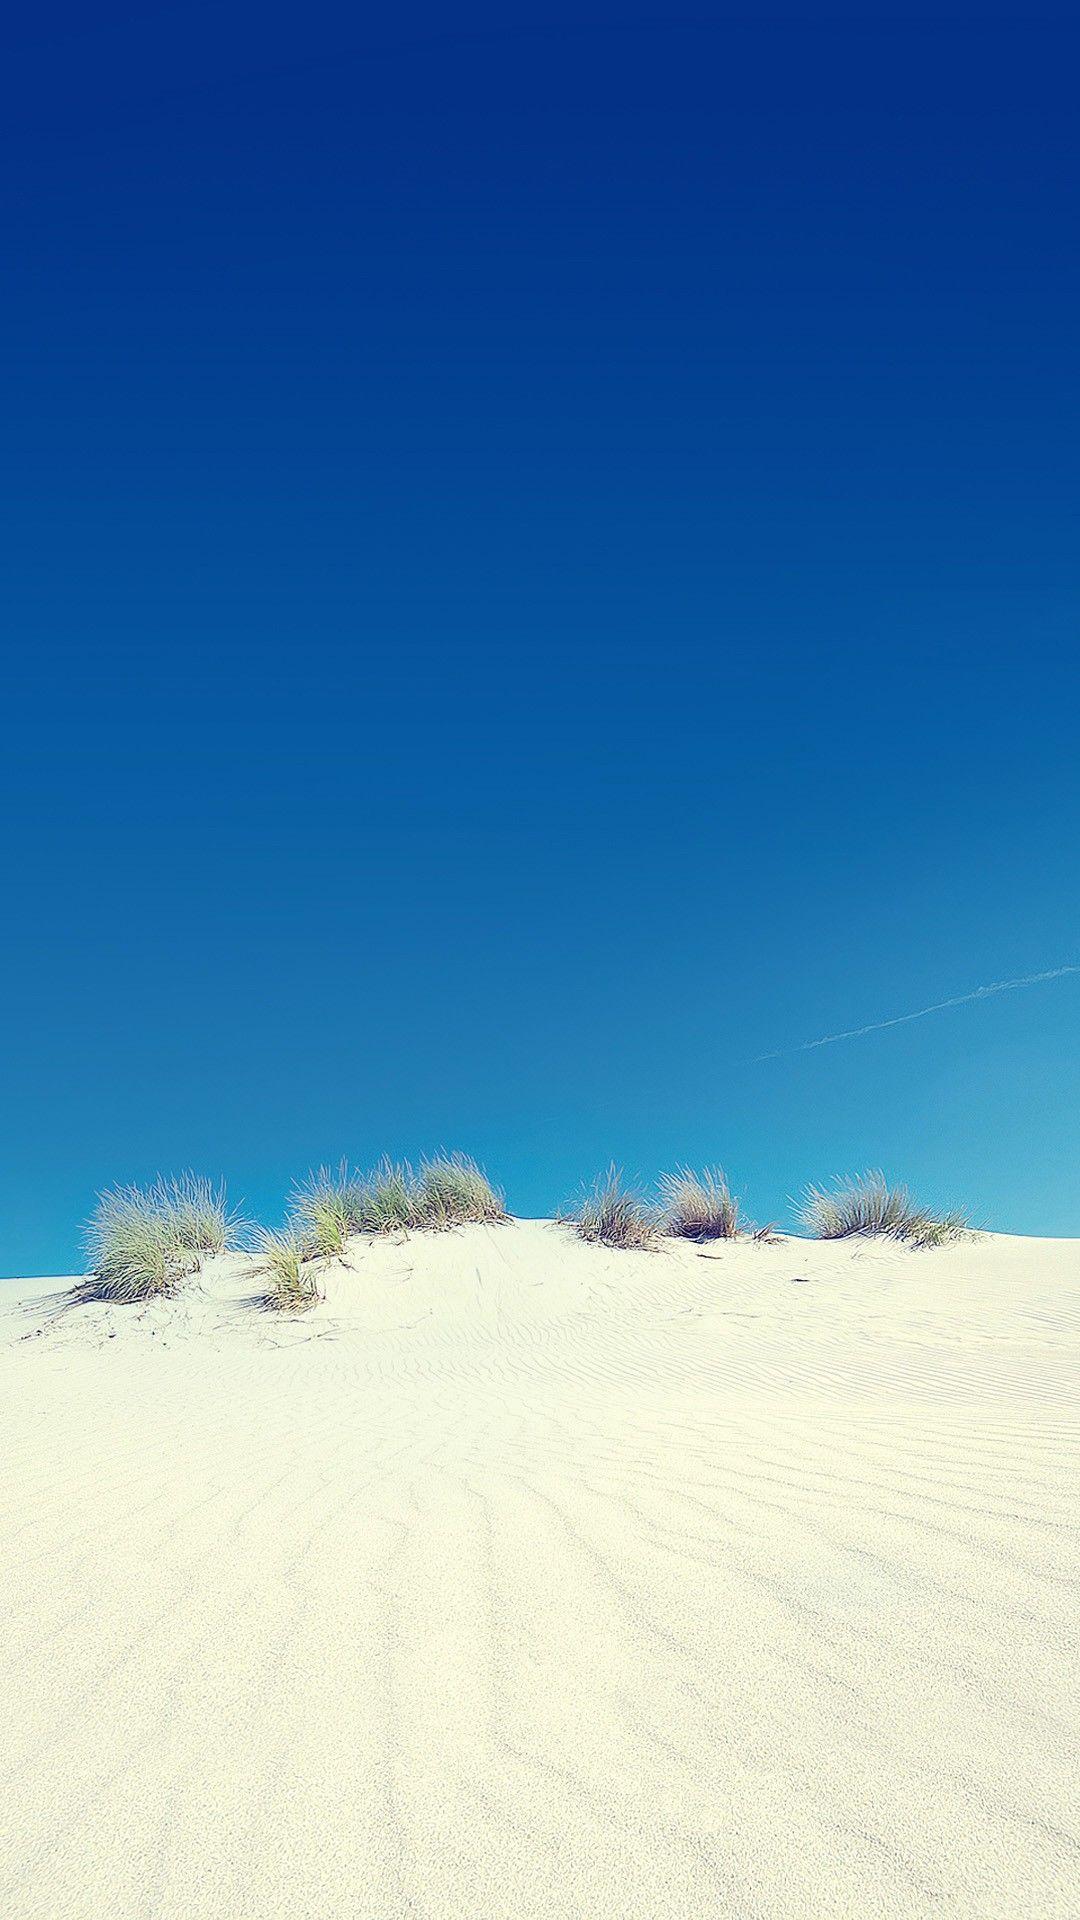 White Beach Sand Blue Sky Lockscreen Smartphone Wallpaper